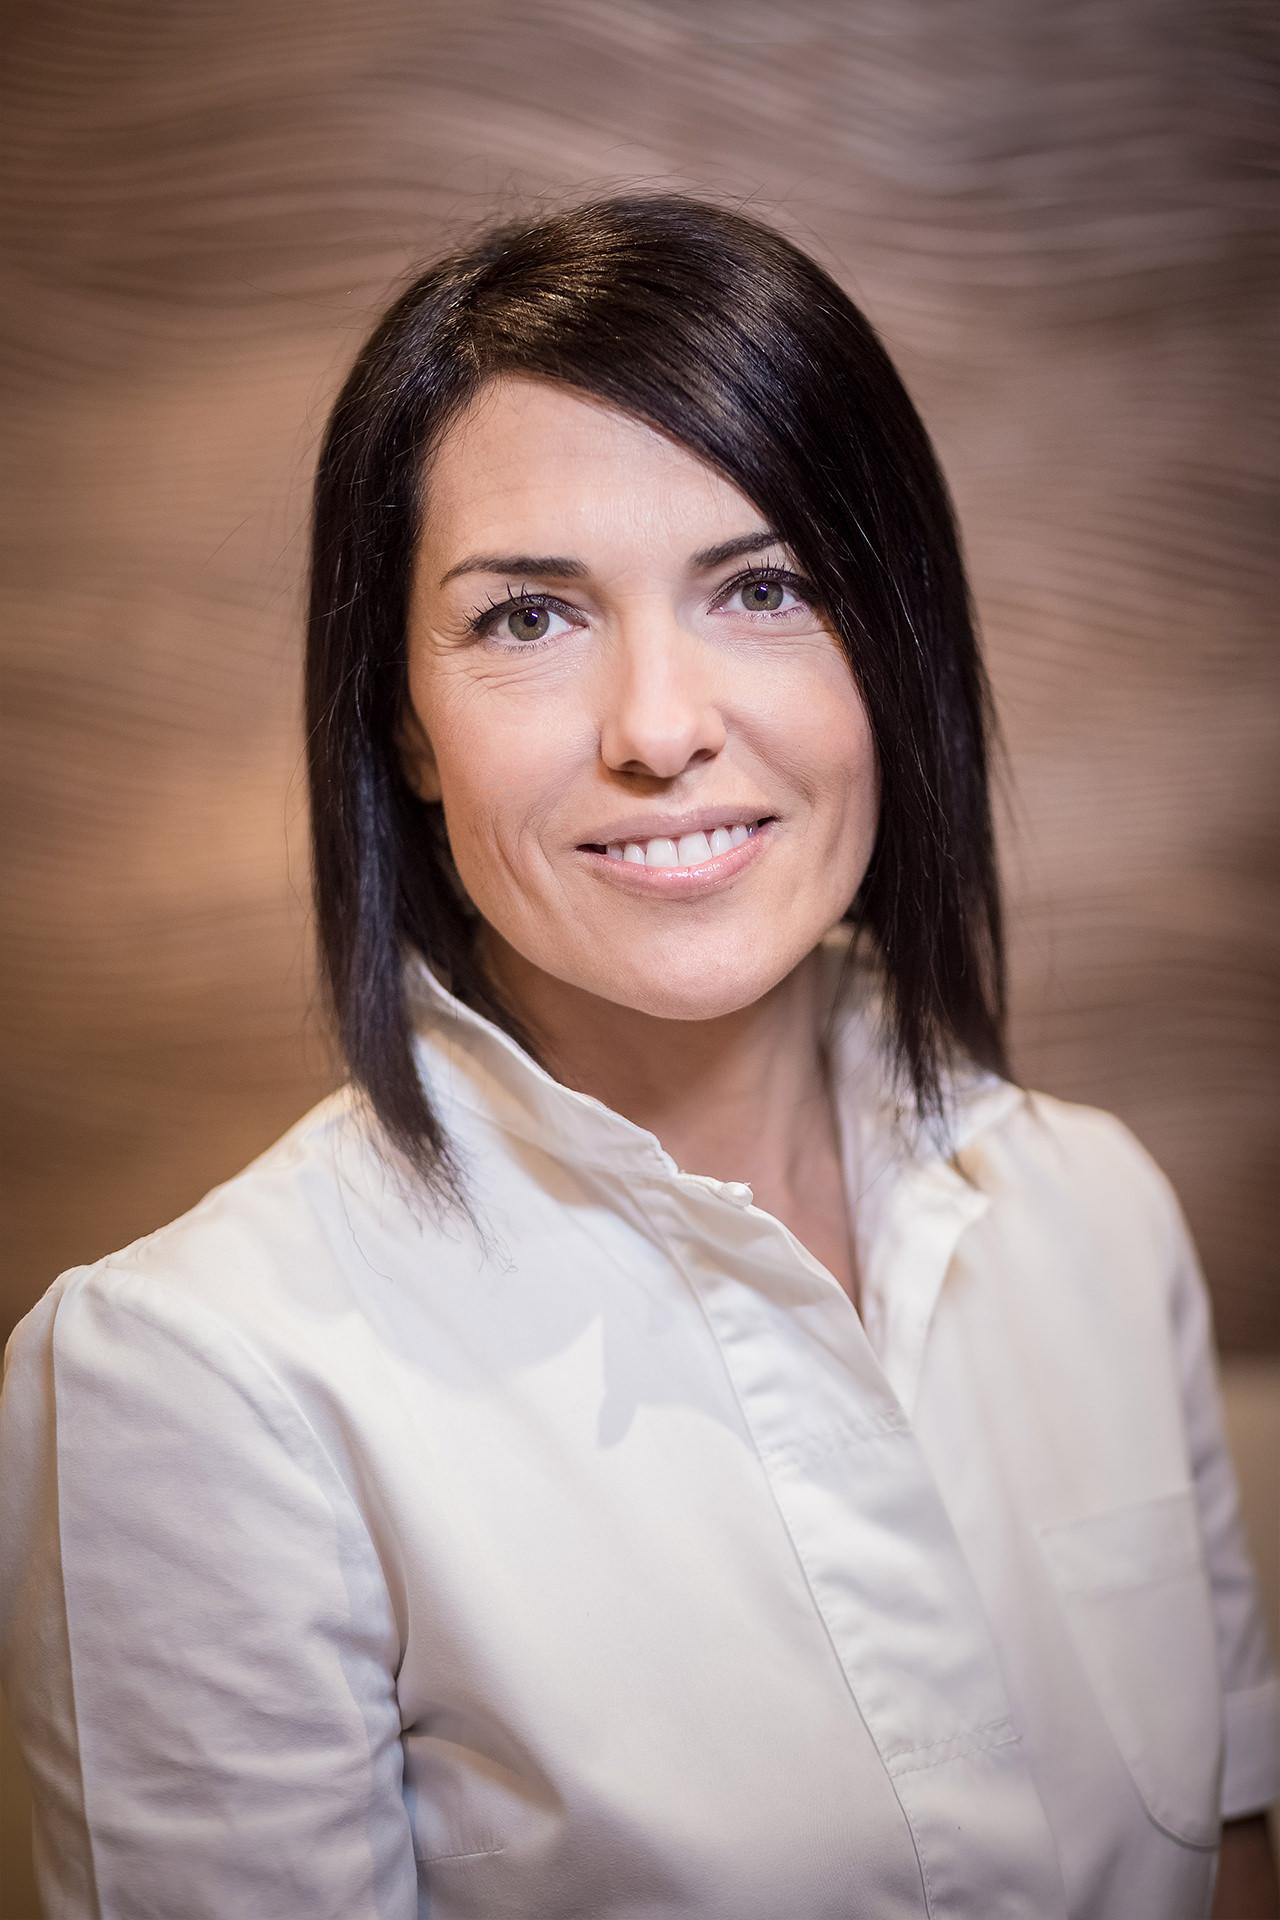 Dott.sa Romina Chiossone